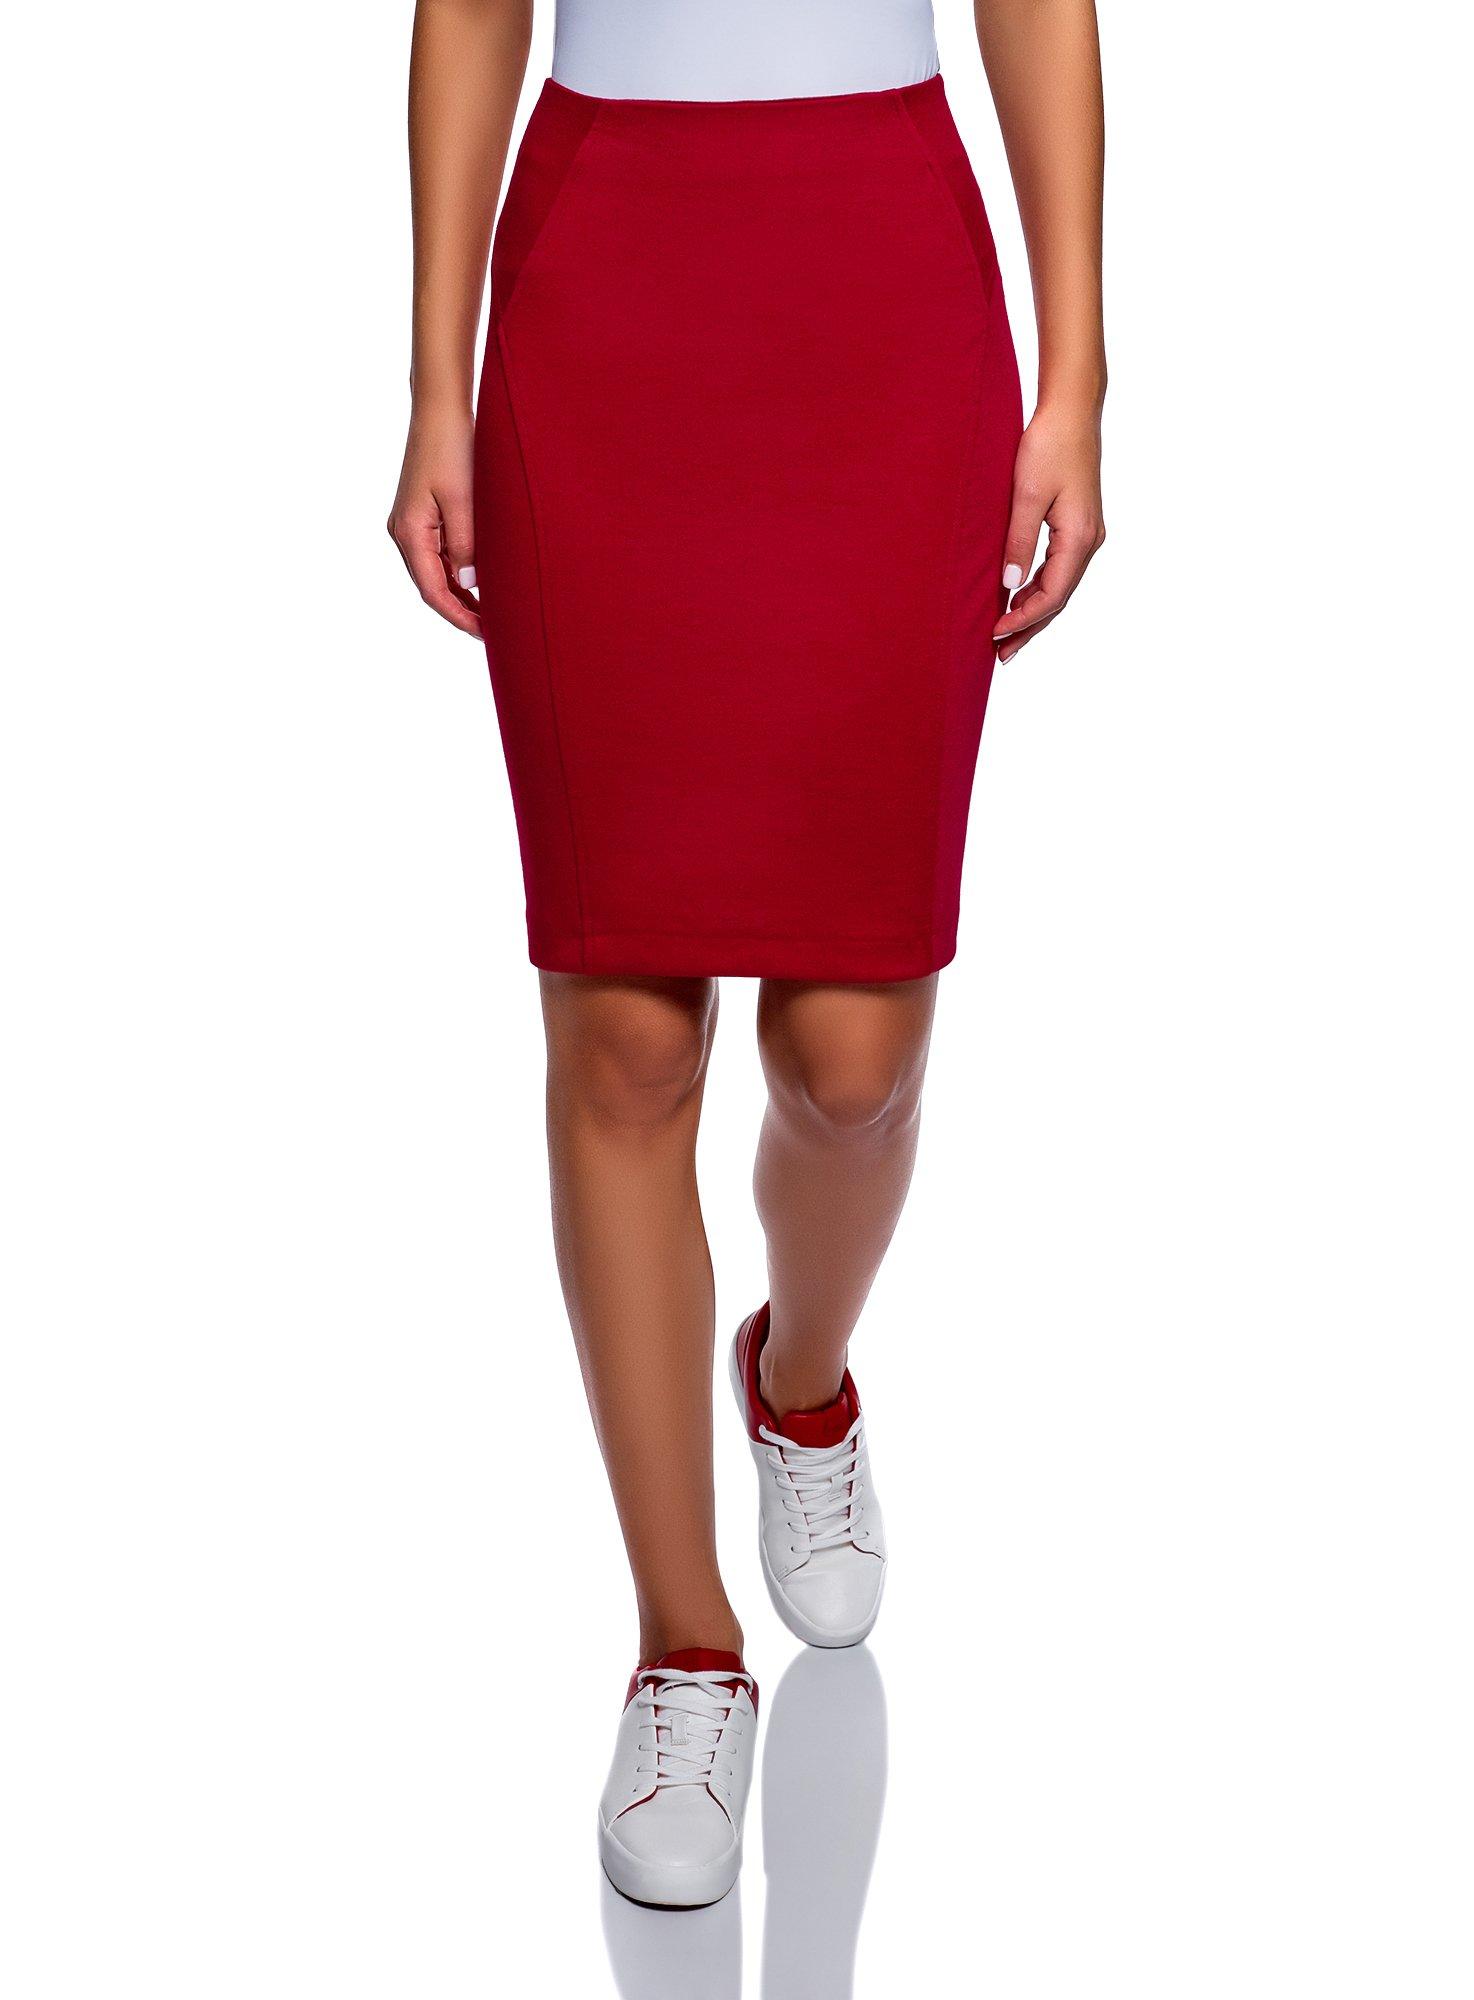 oodji Ultra Women's Jersey Pencil Skirt, Red, 6